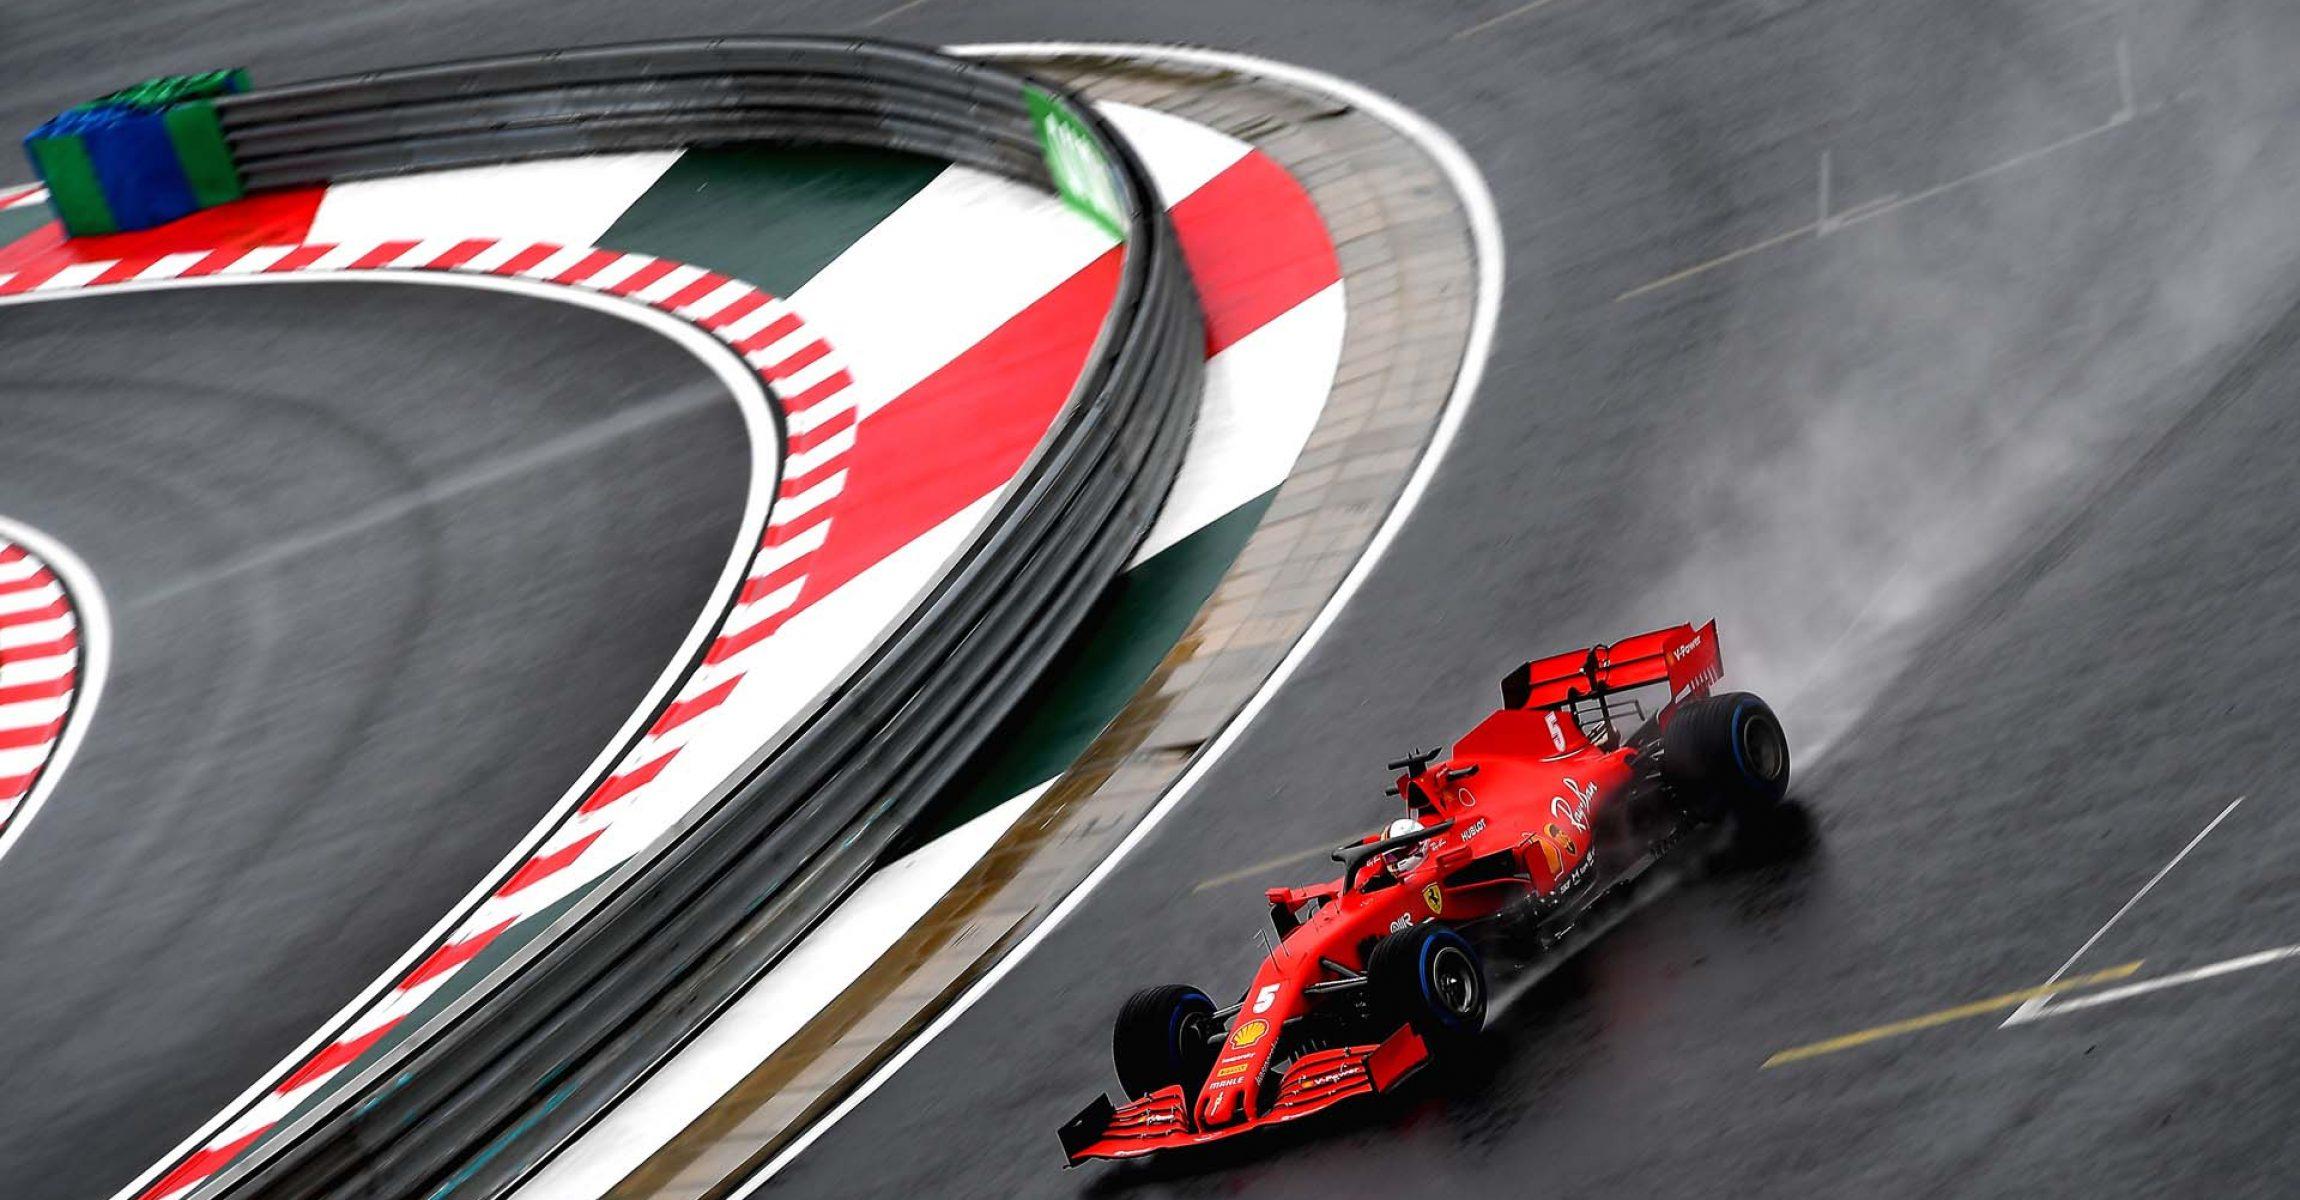 GP UNGHERIA F1/2020 - VENERDÌ 17/07/2020 credit: @Scuderia Ferrari Press Office Sebastian Vettel